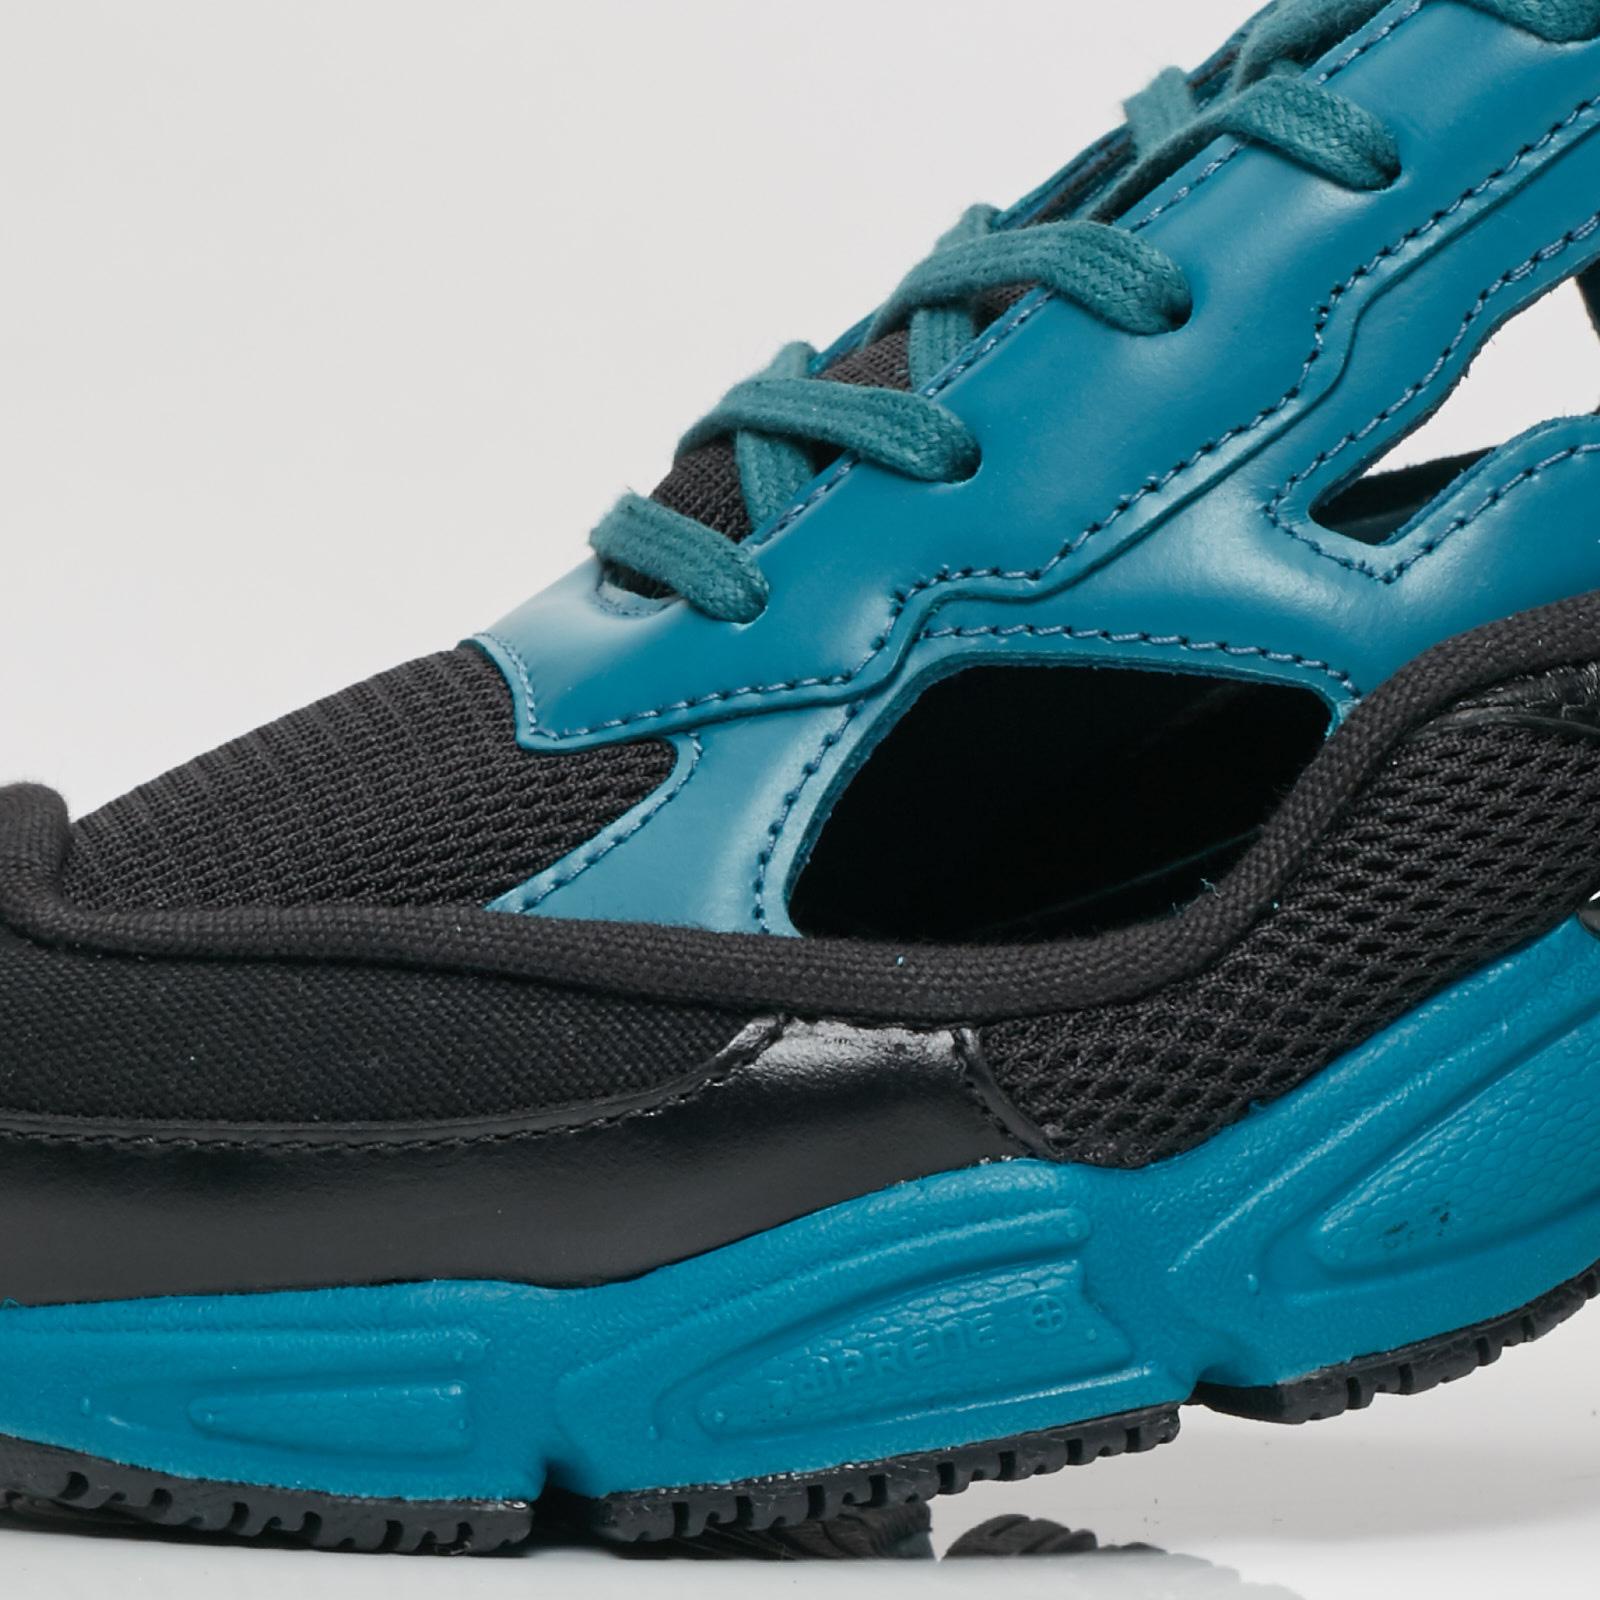 caf0d78e194f3f adidas Replicant Ozweego - Bb7986 - Sneakersnstuff